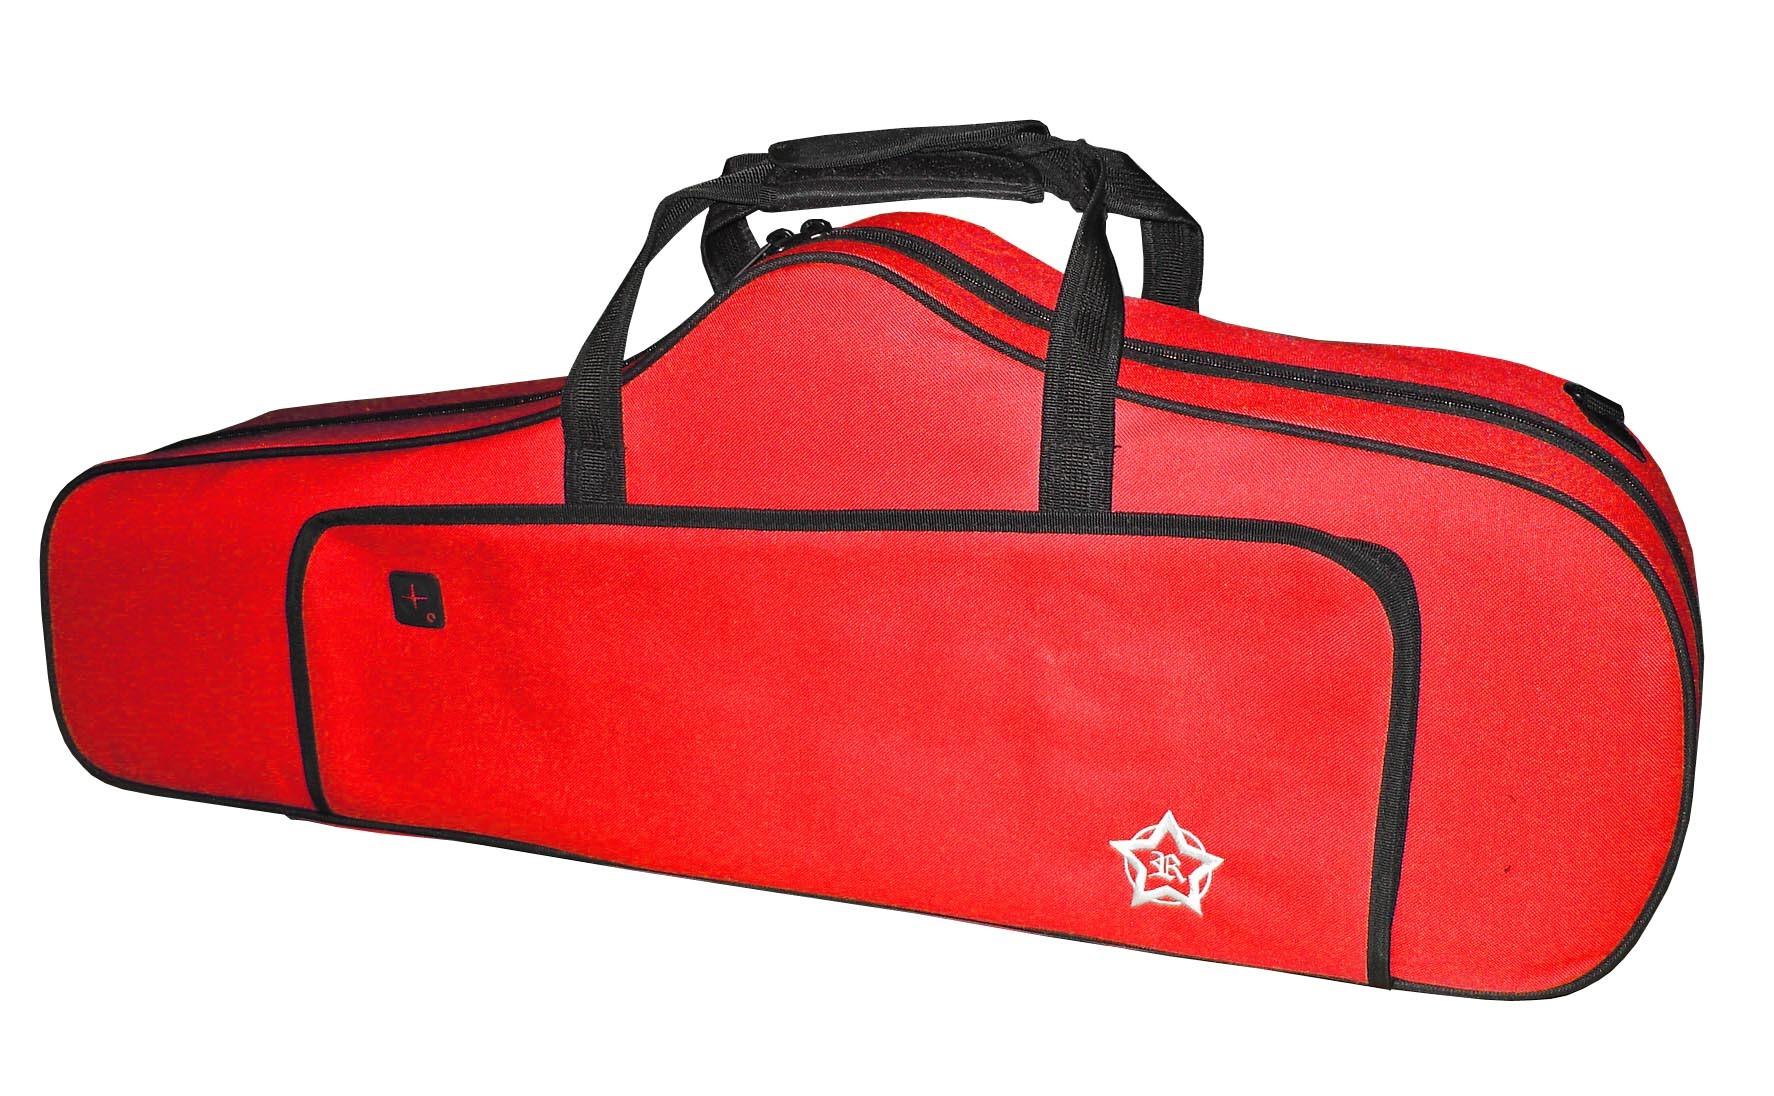 Rosetti Tenor Saxophone Bag - Red